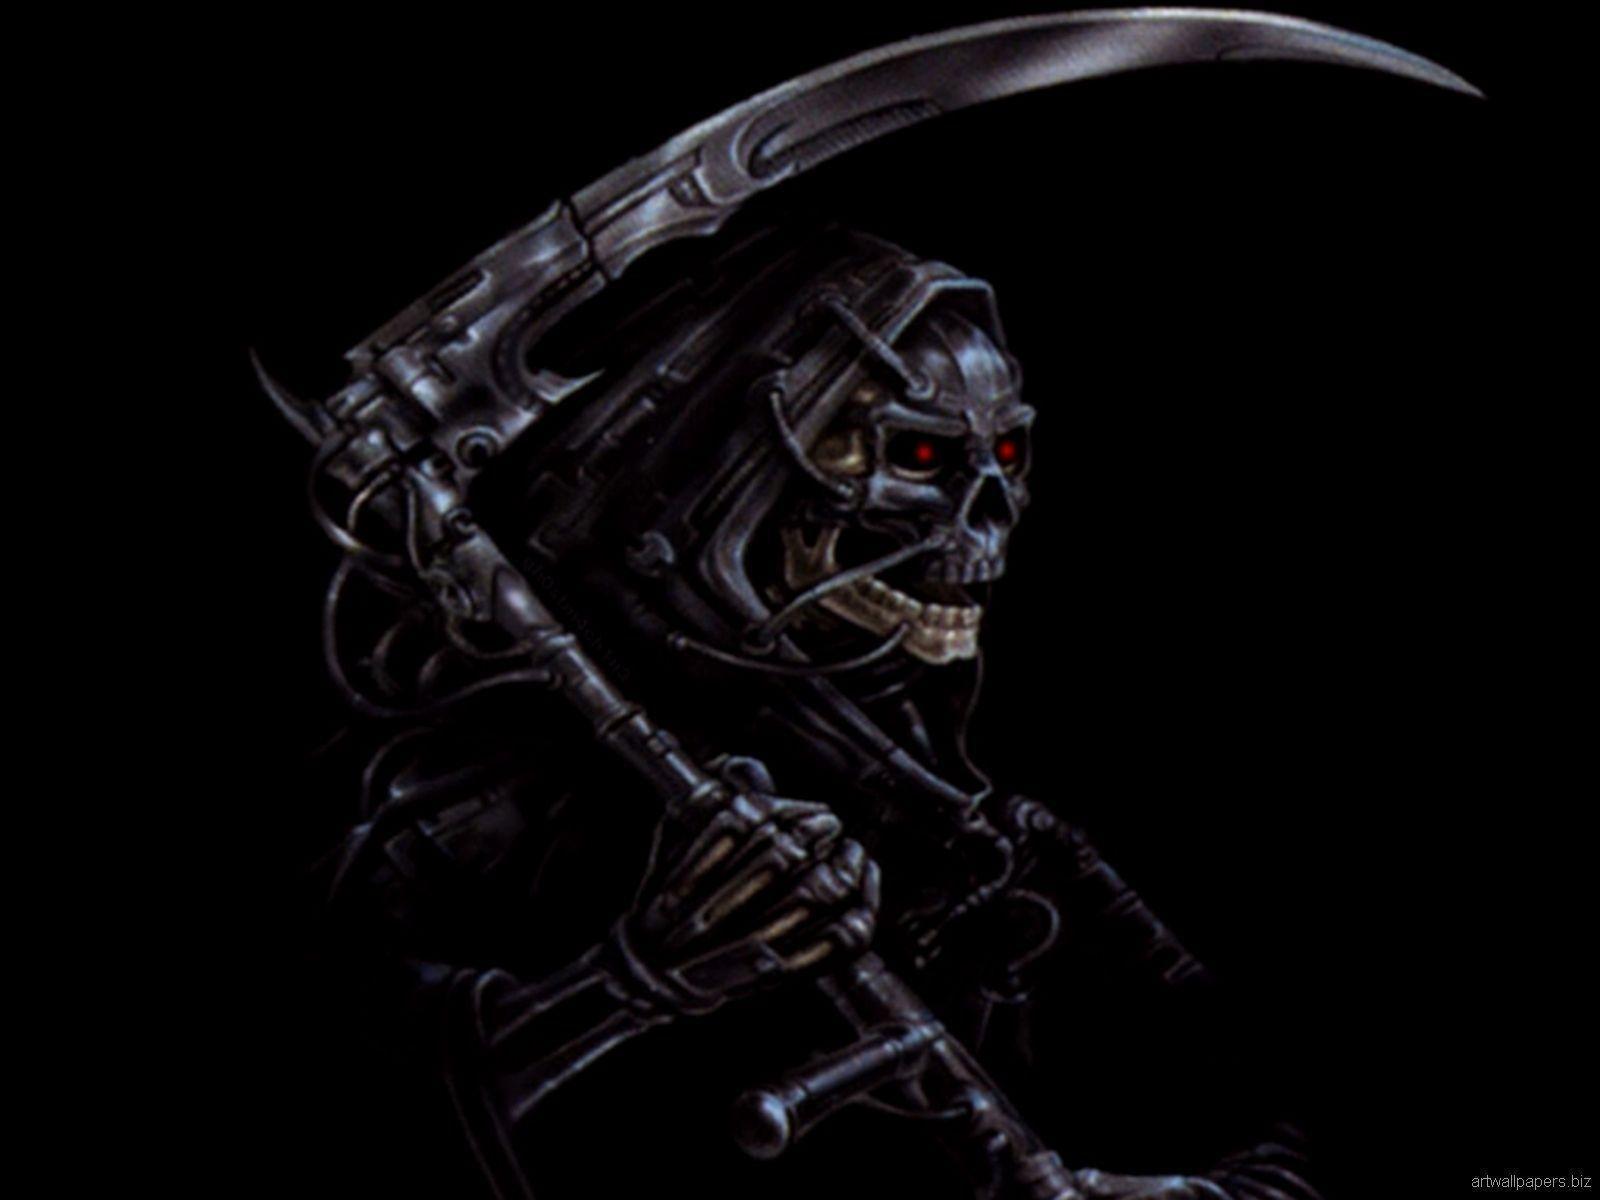 Skull desktop wallpapers wallpaper cave - Skeleton wallpaper ...